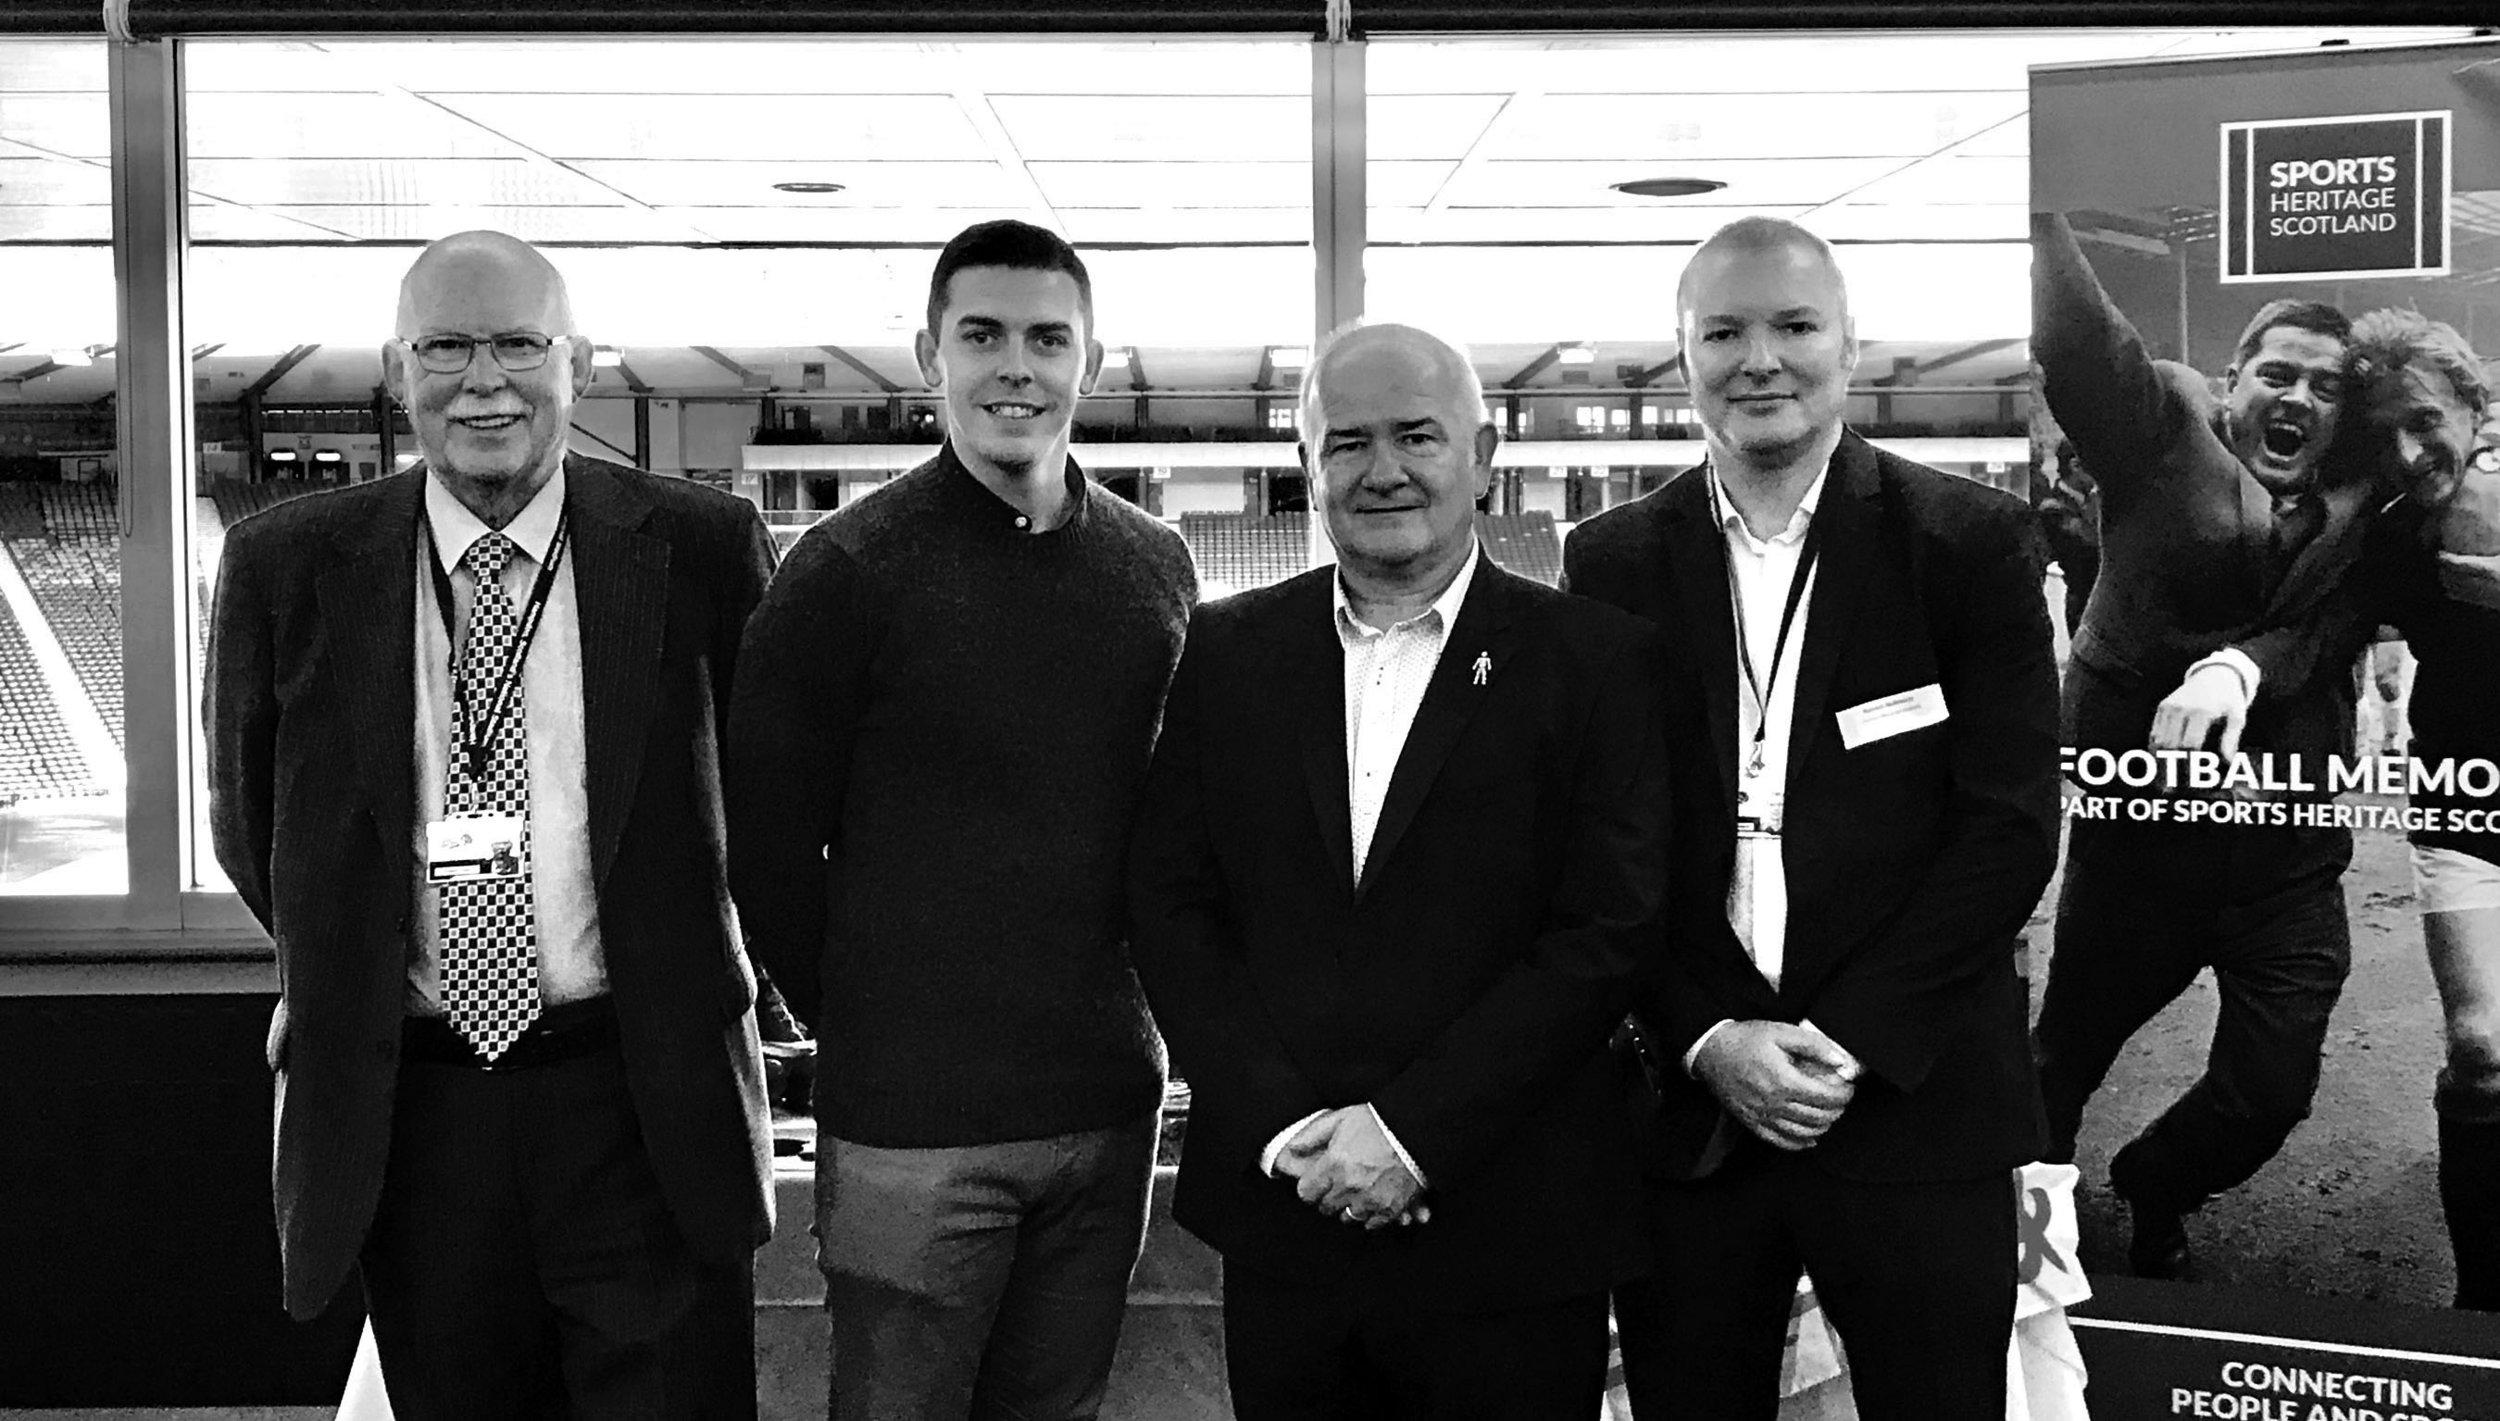 l-r Robert Craig, Chair of Football Memories Scotland and Scottish Football Museum, Matt Ramsay WFS, Gary McLaughlin WFS and Richard McBrearty, Football Memories Project Director.